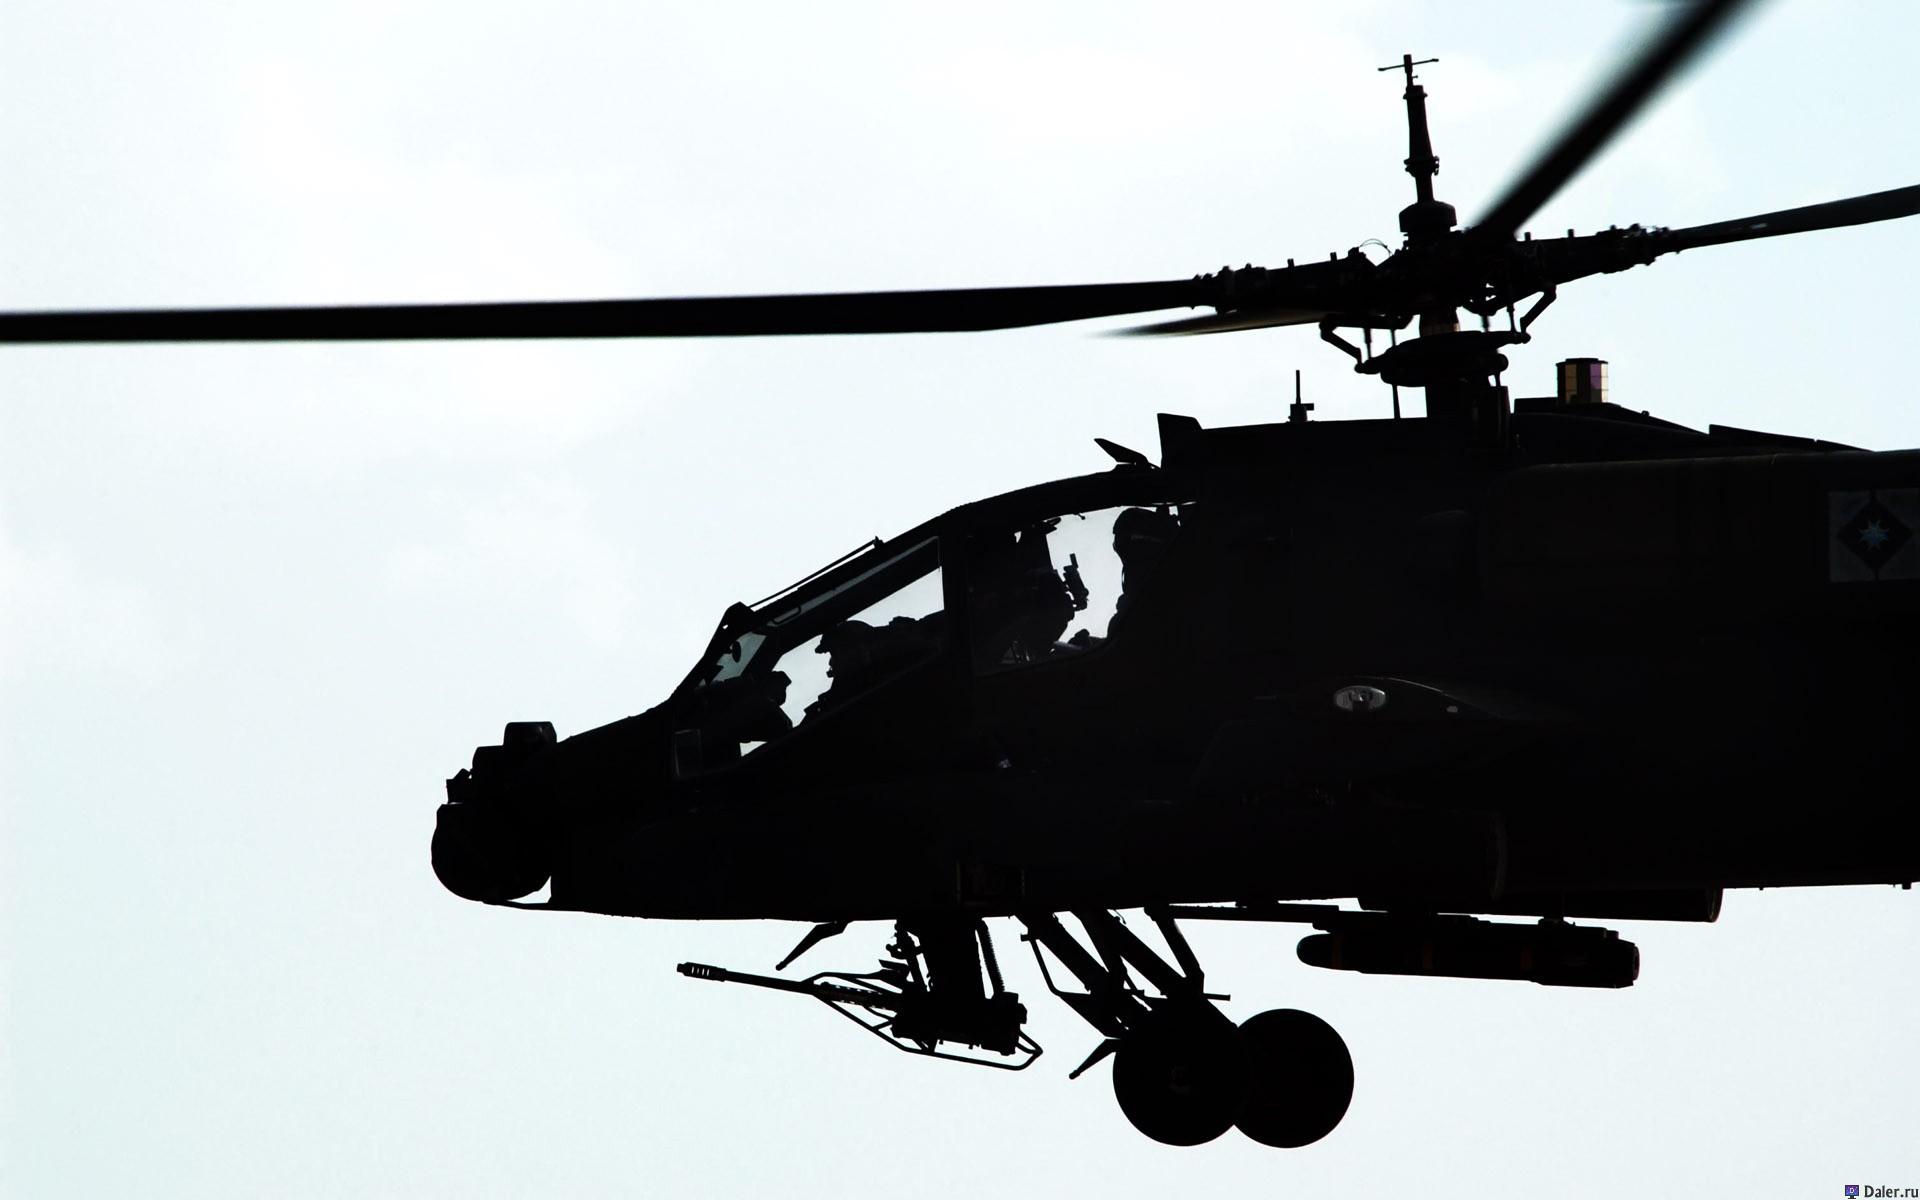 силуэт вертолета, helicopter, фото, wallpaper, обои на рабочий стол